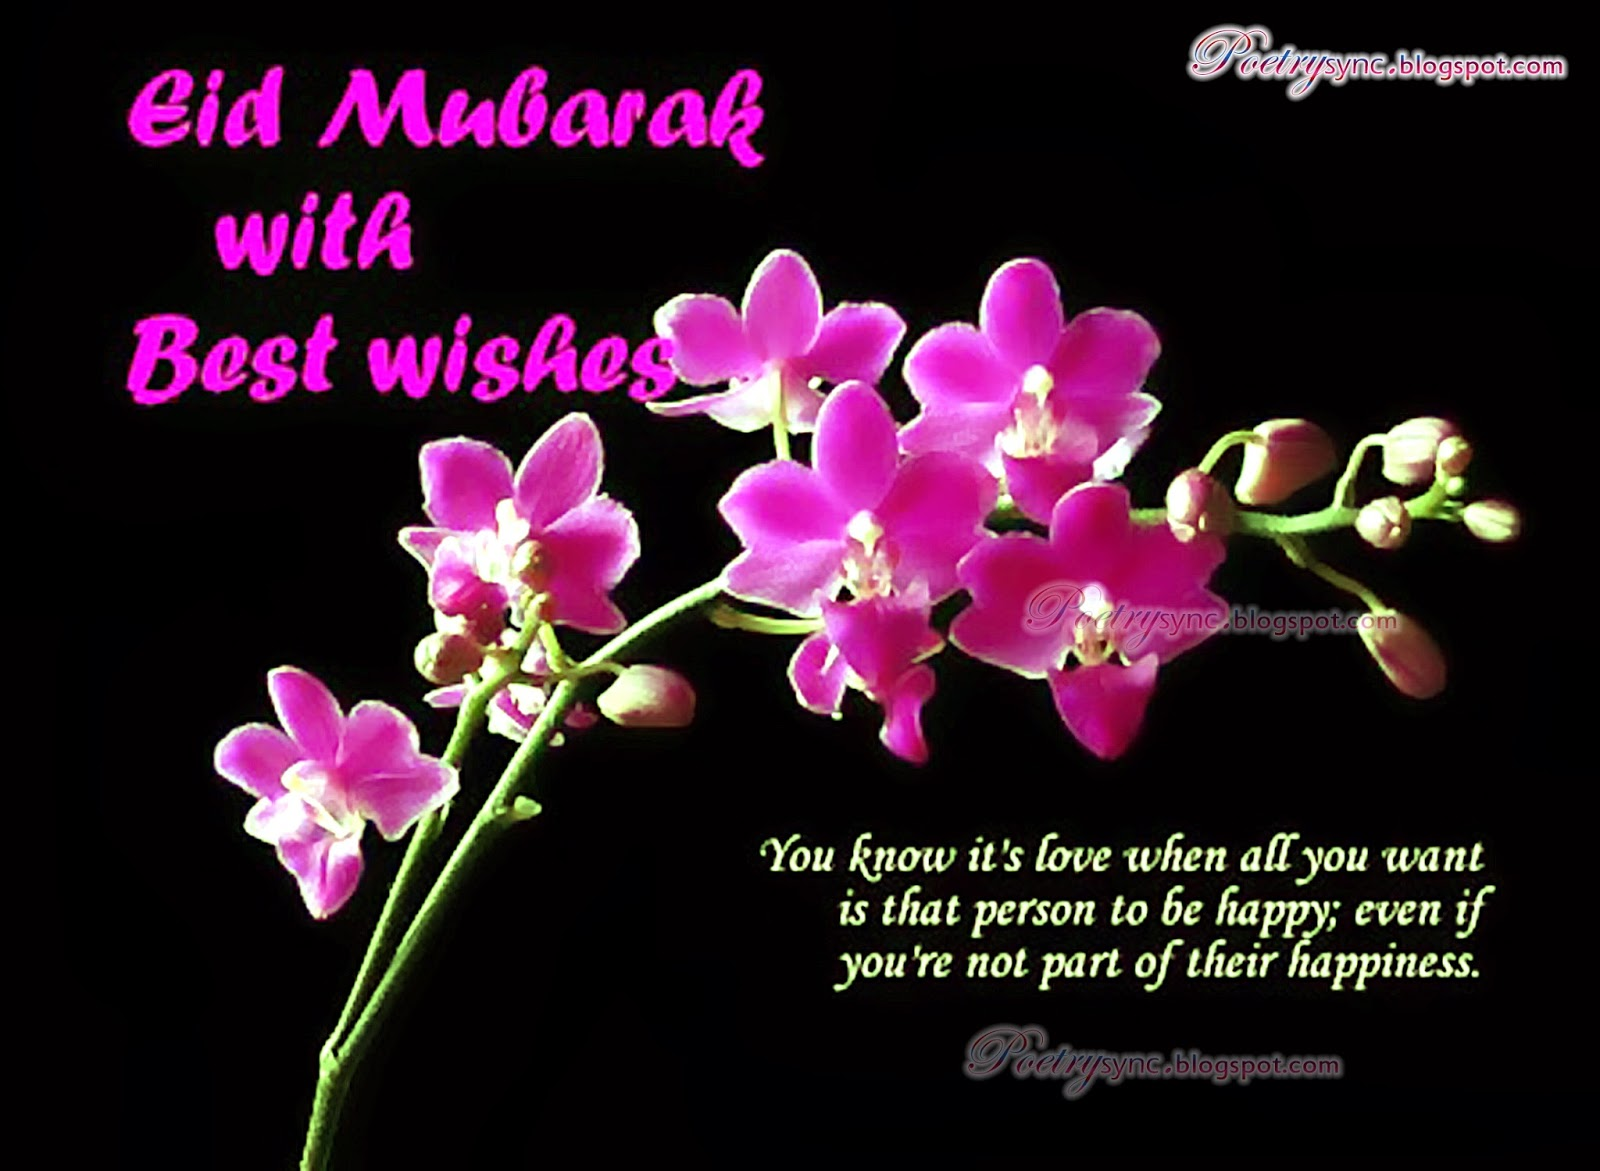 Eid mubarak quotes hd wallpapers 2015 sk friendz club eid mubarak quotes hd wallpapers 2015 kristyandbryce Images